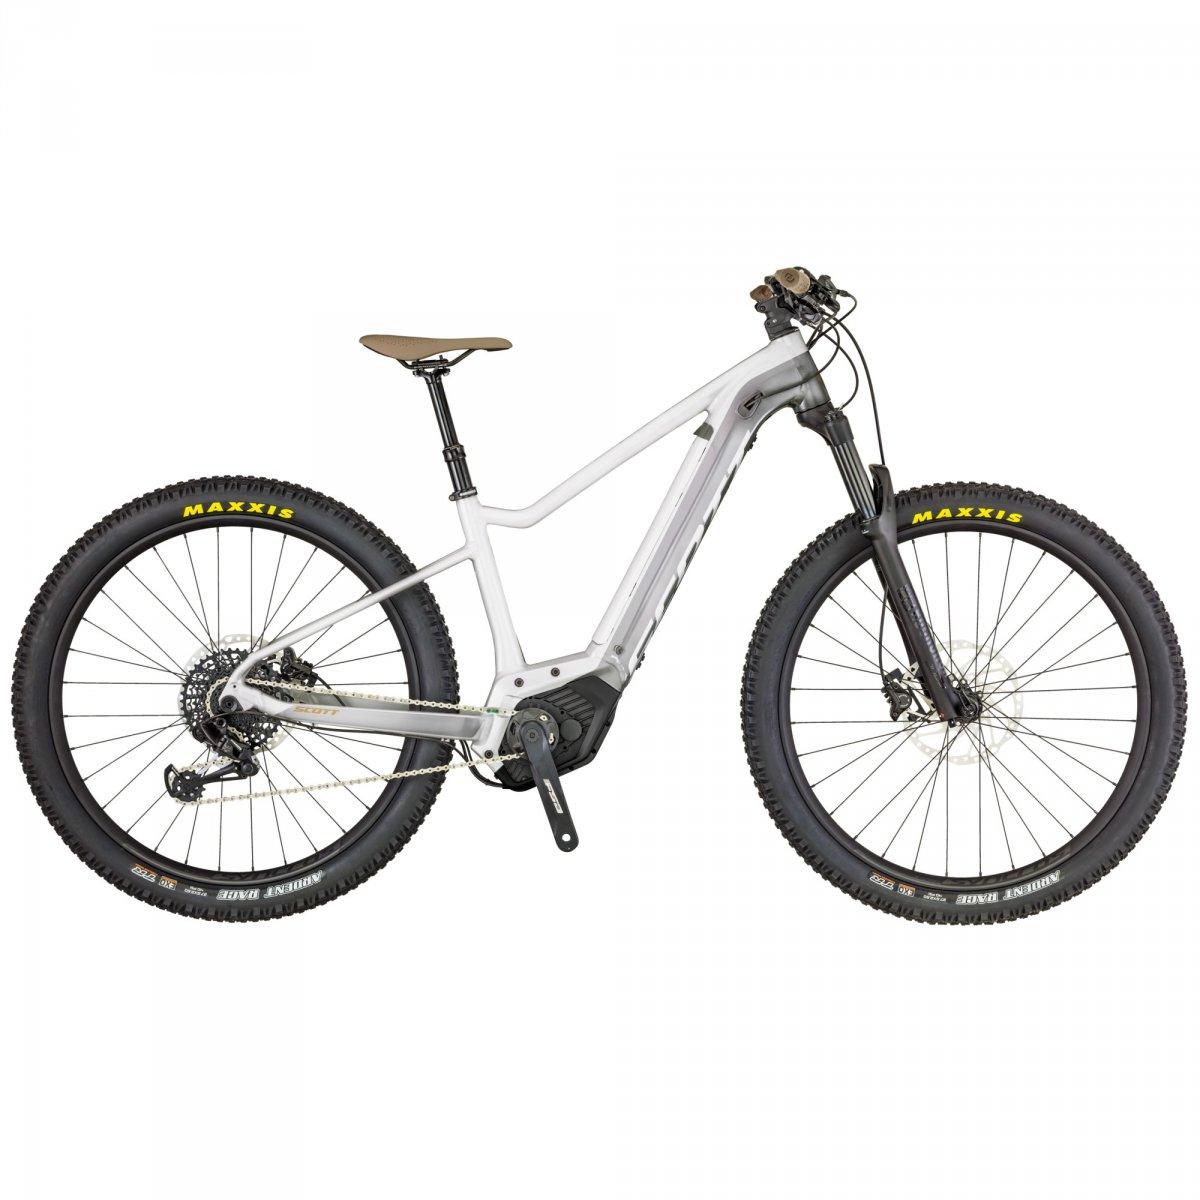 SCOTT Bike Contessa Aspect eRide 10, 3.599,00 €, bikepirat